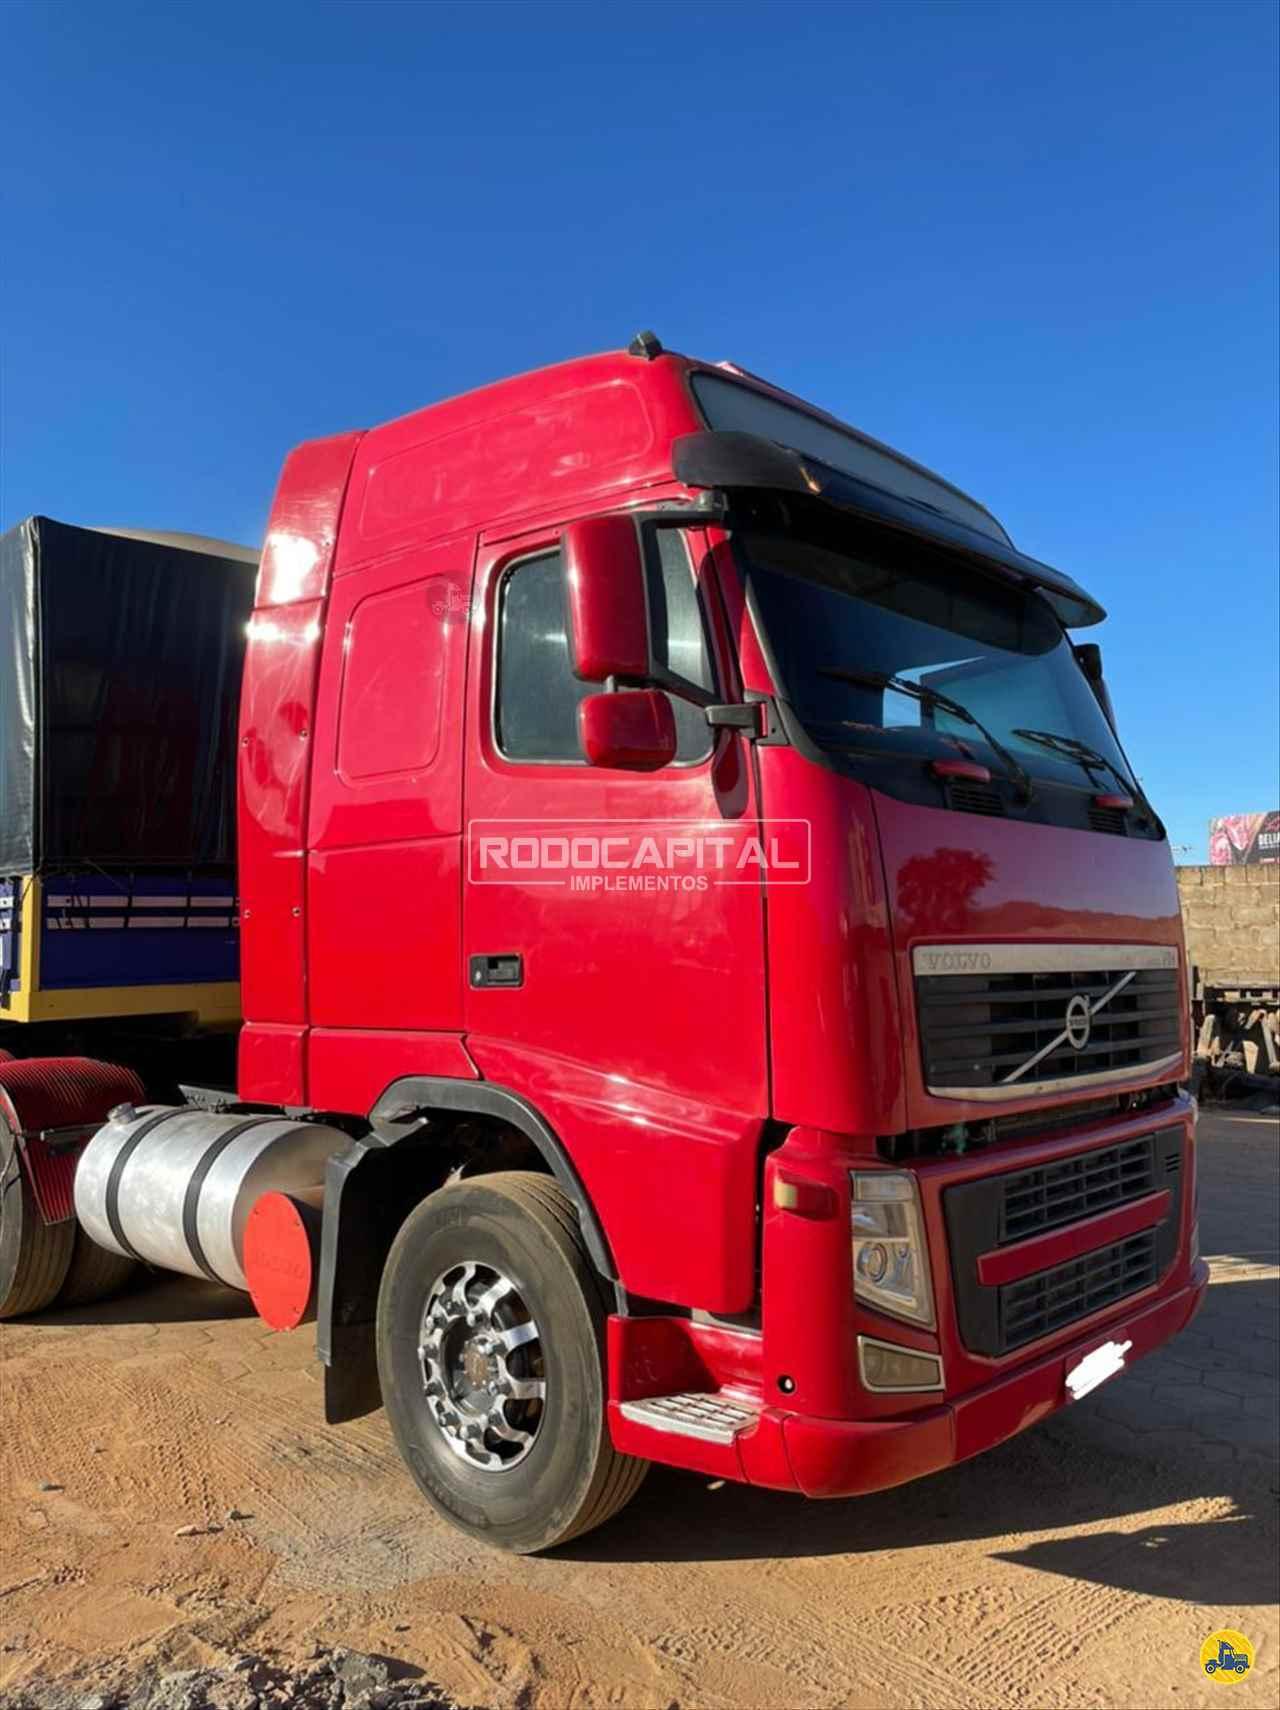 CAMINHAO VOLVO VOLVO FH 480 Cavalo Mecânico Traçado 6x4 RODOCAPITAL - TRUCKVAN BRASILIA DISTRITO FEDERAL DF